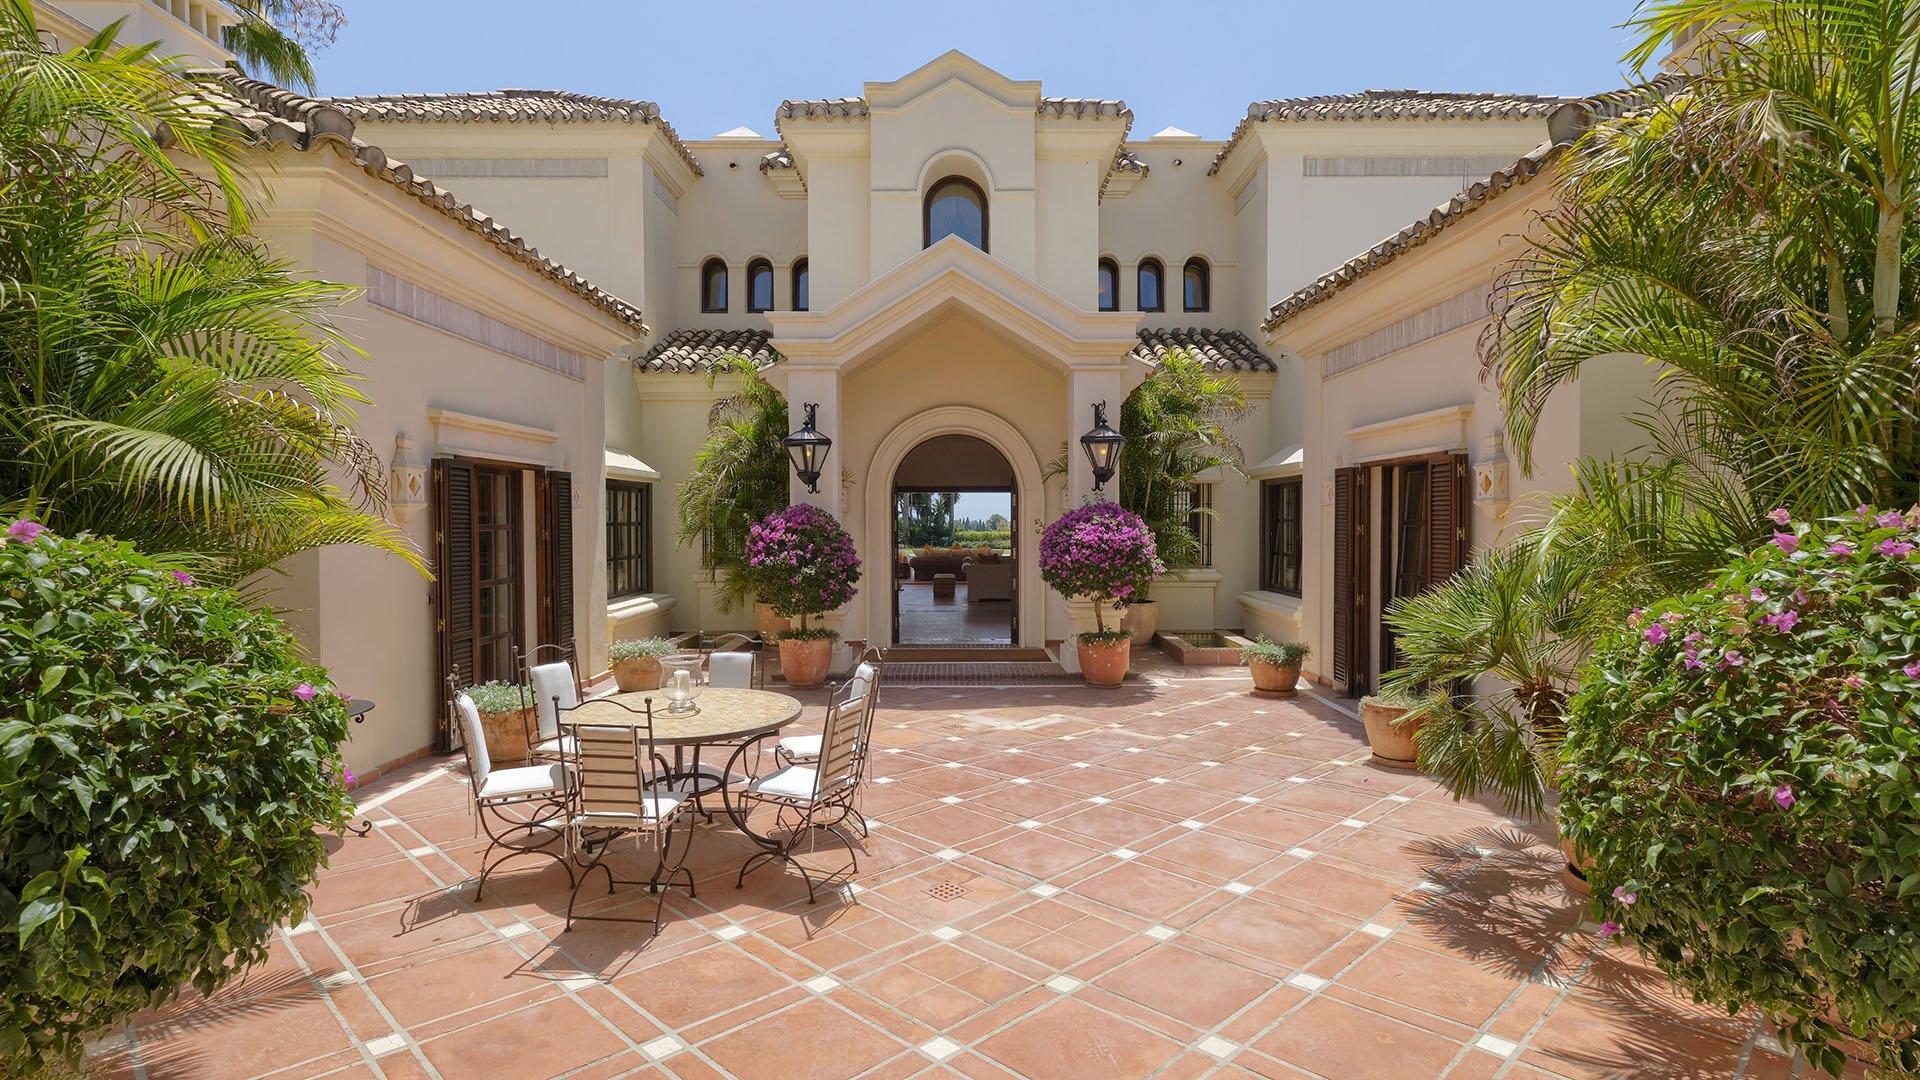 Villa La Rotonda: Beautiful classic villa at the Marbella Hill Club